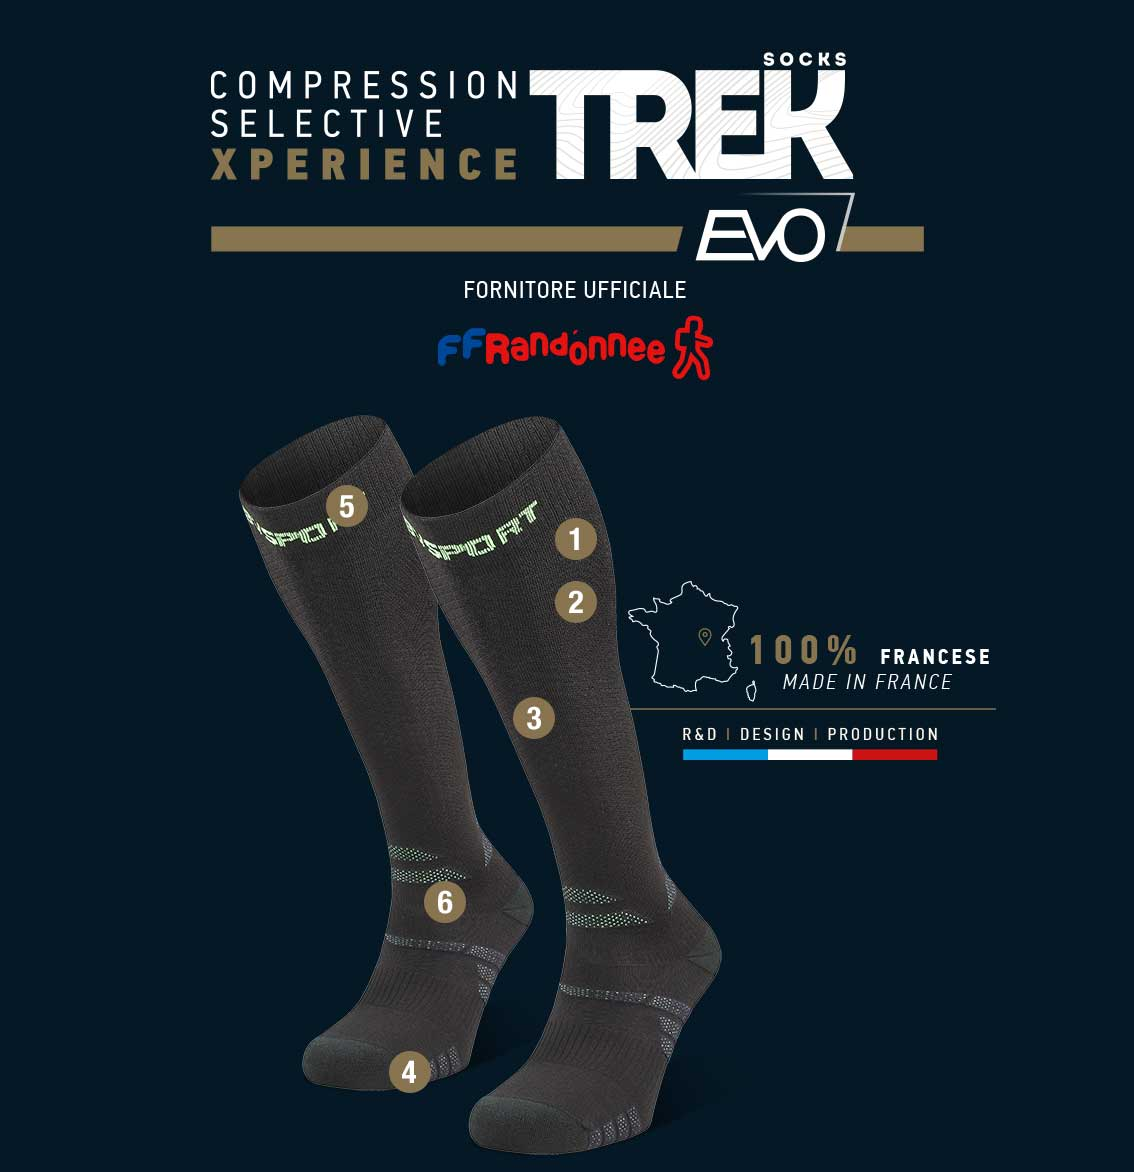 Calza_da_trekking_Trek_compression_EVO_nero-verde